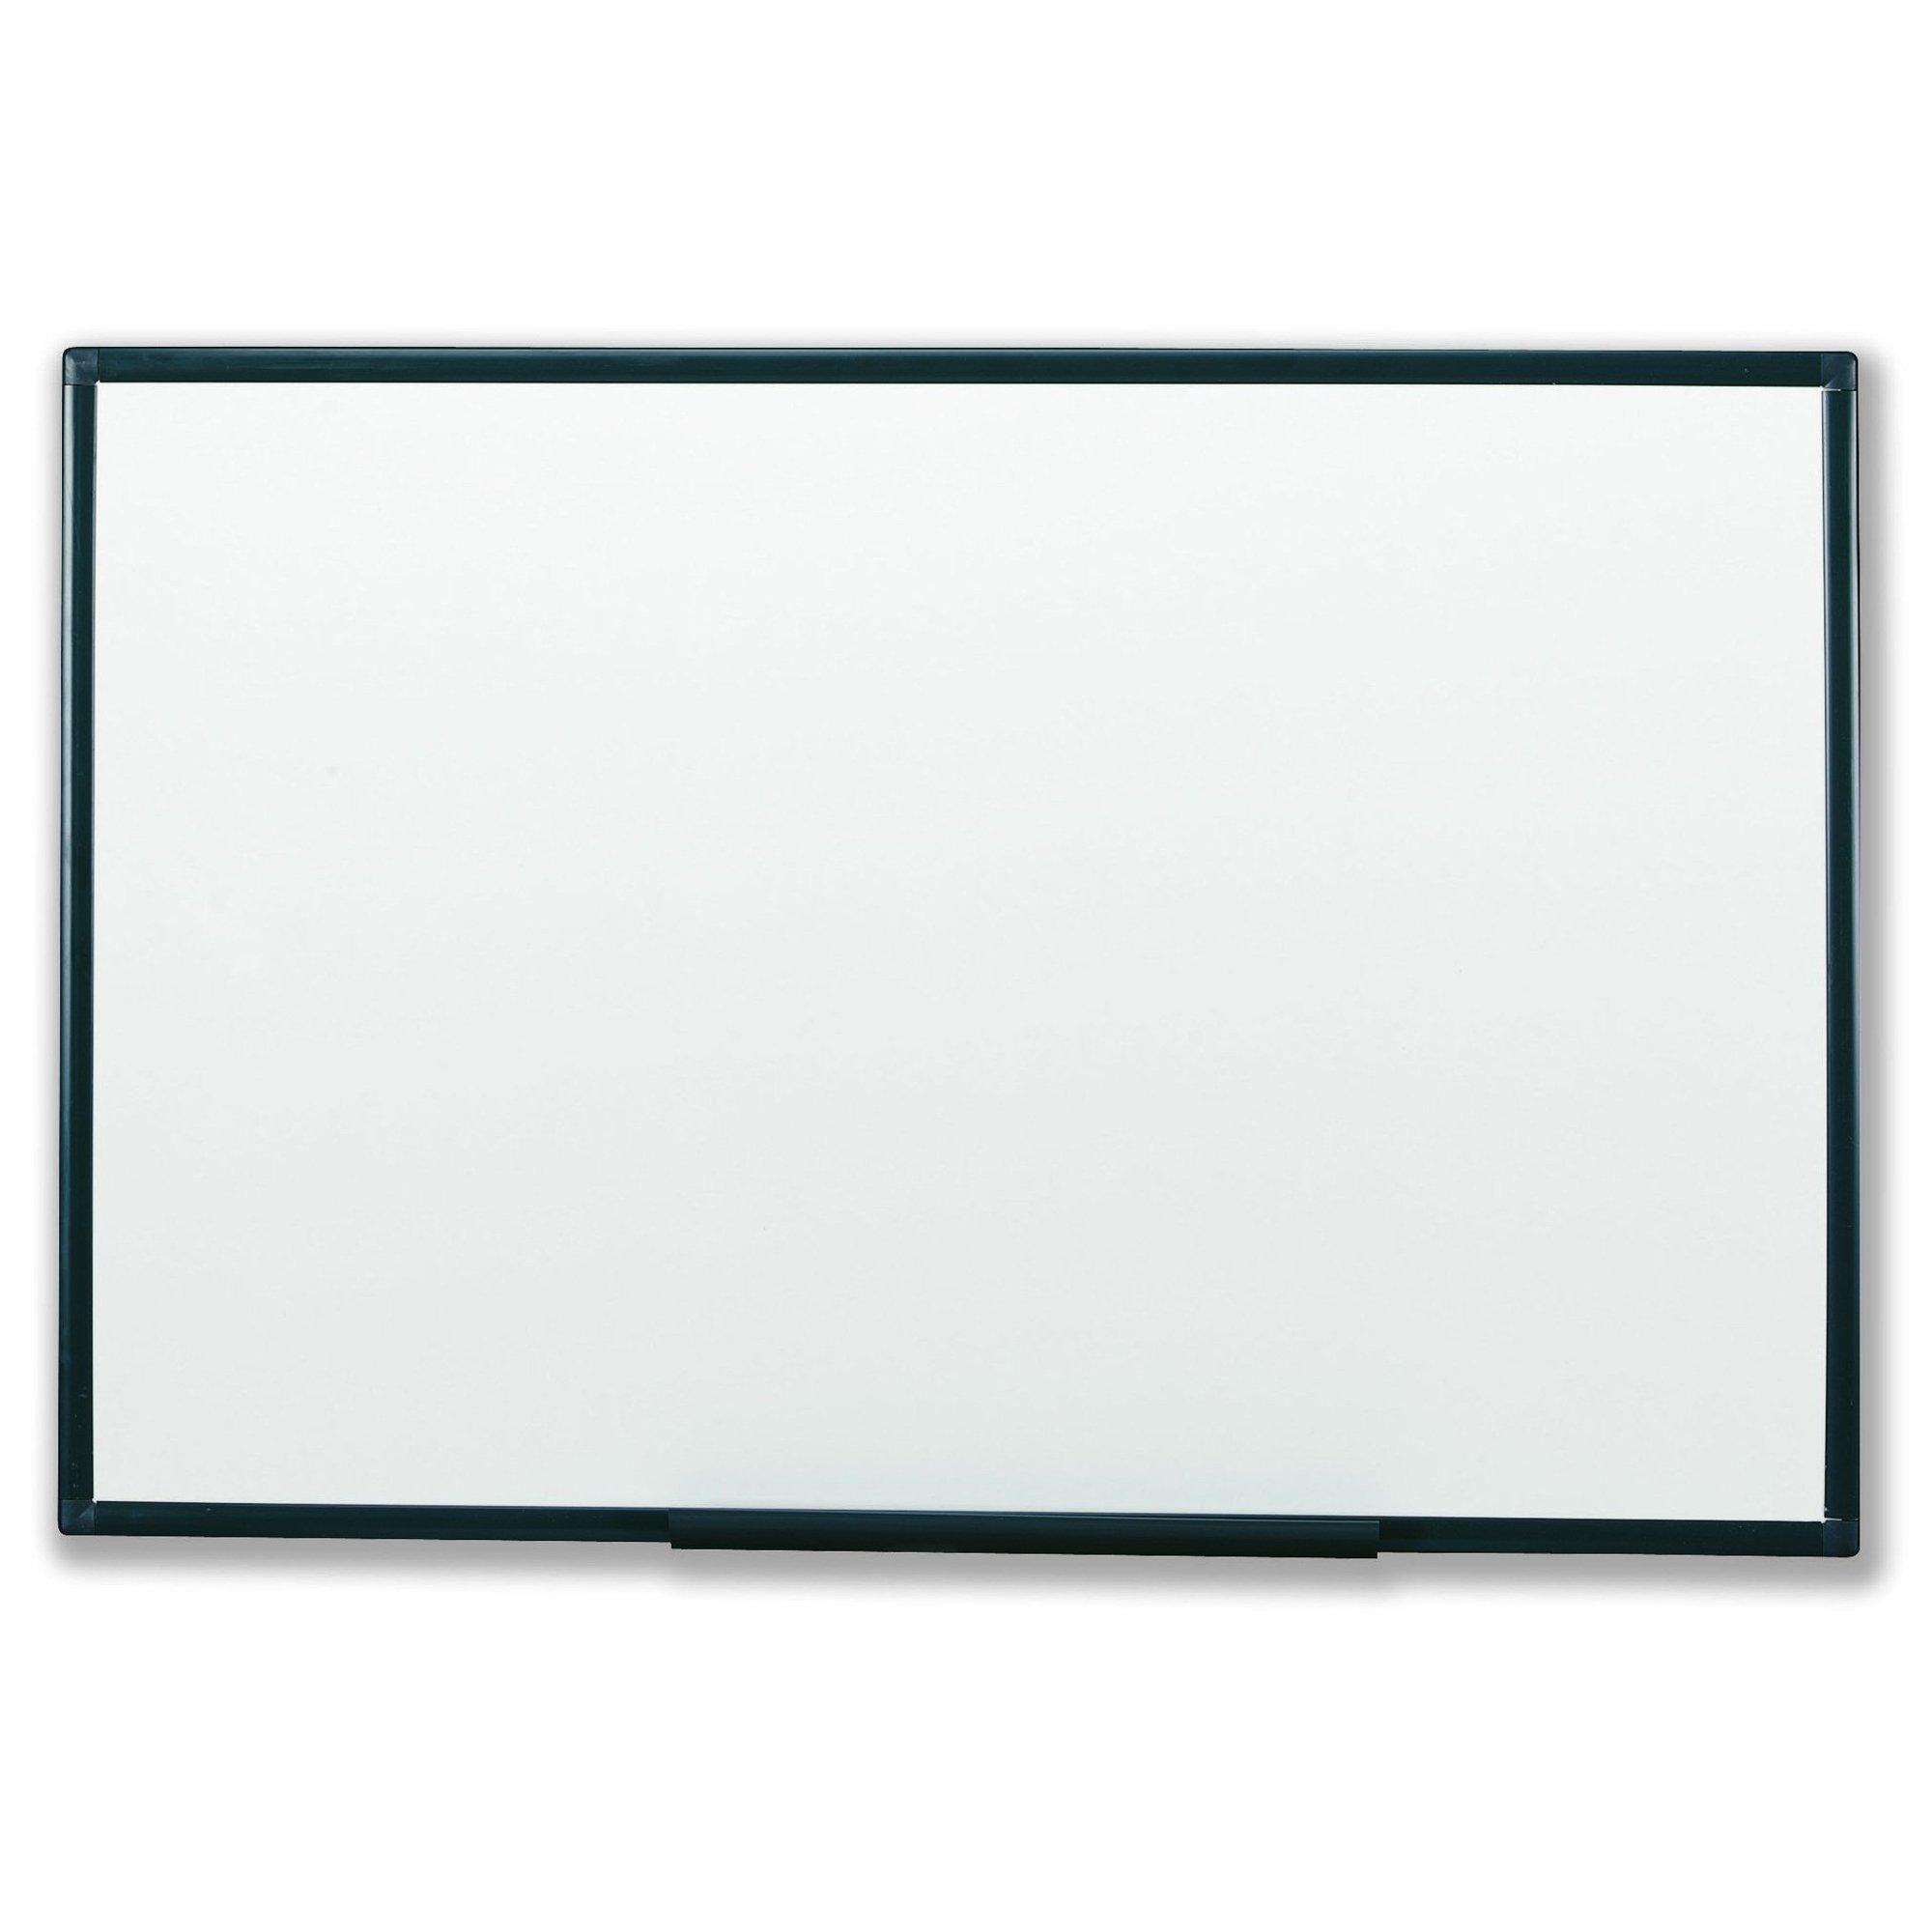 Value Drywipe Board 900x600mm